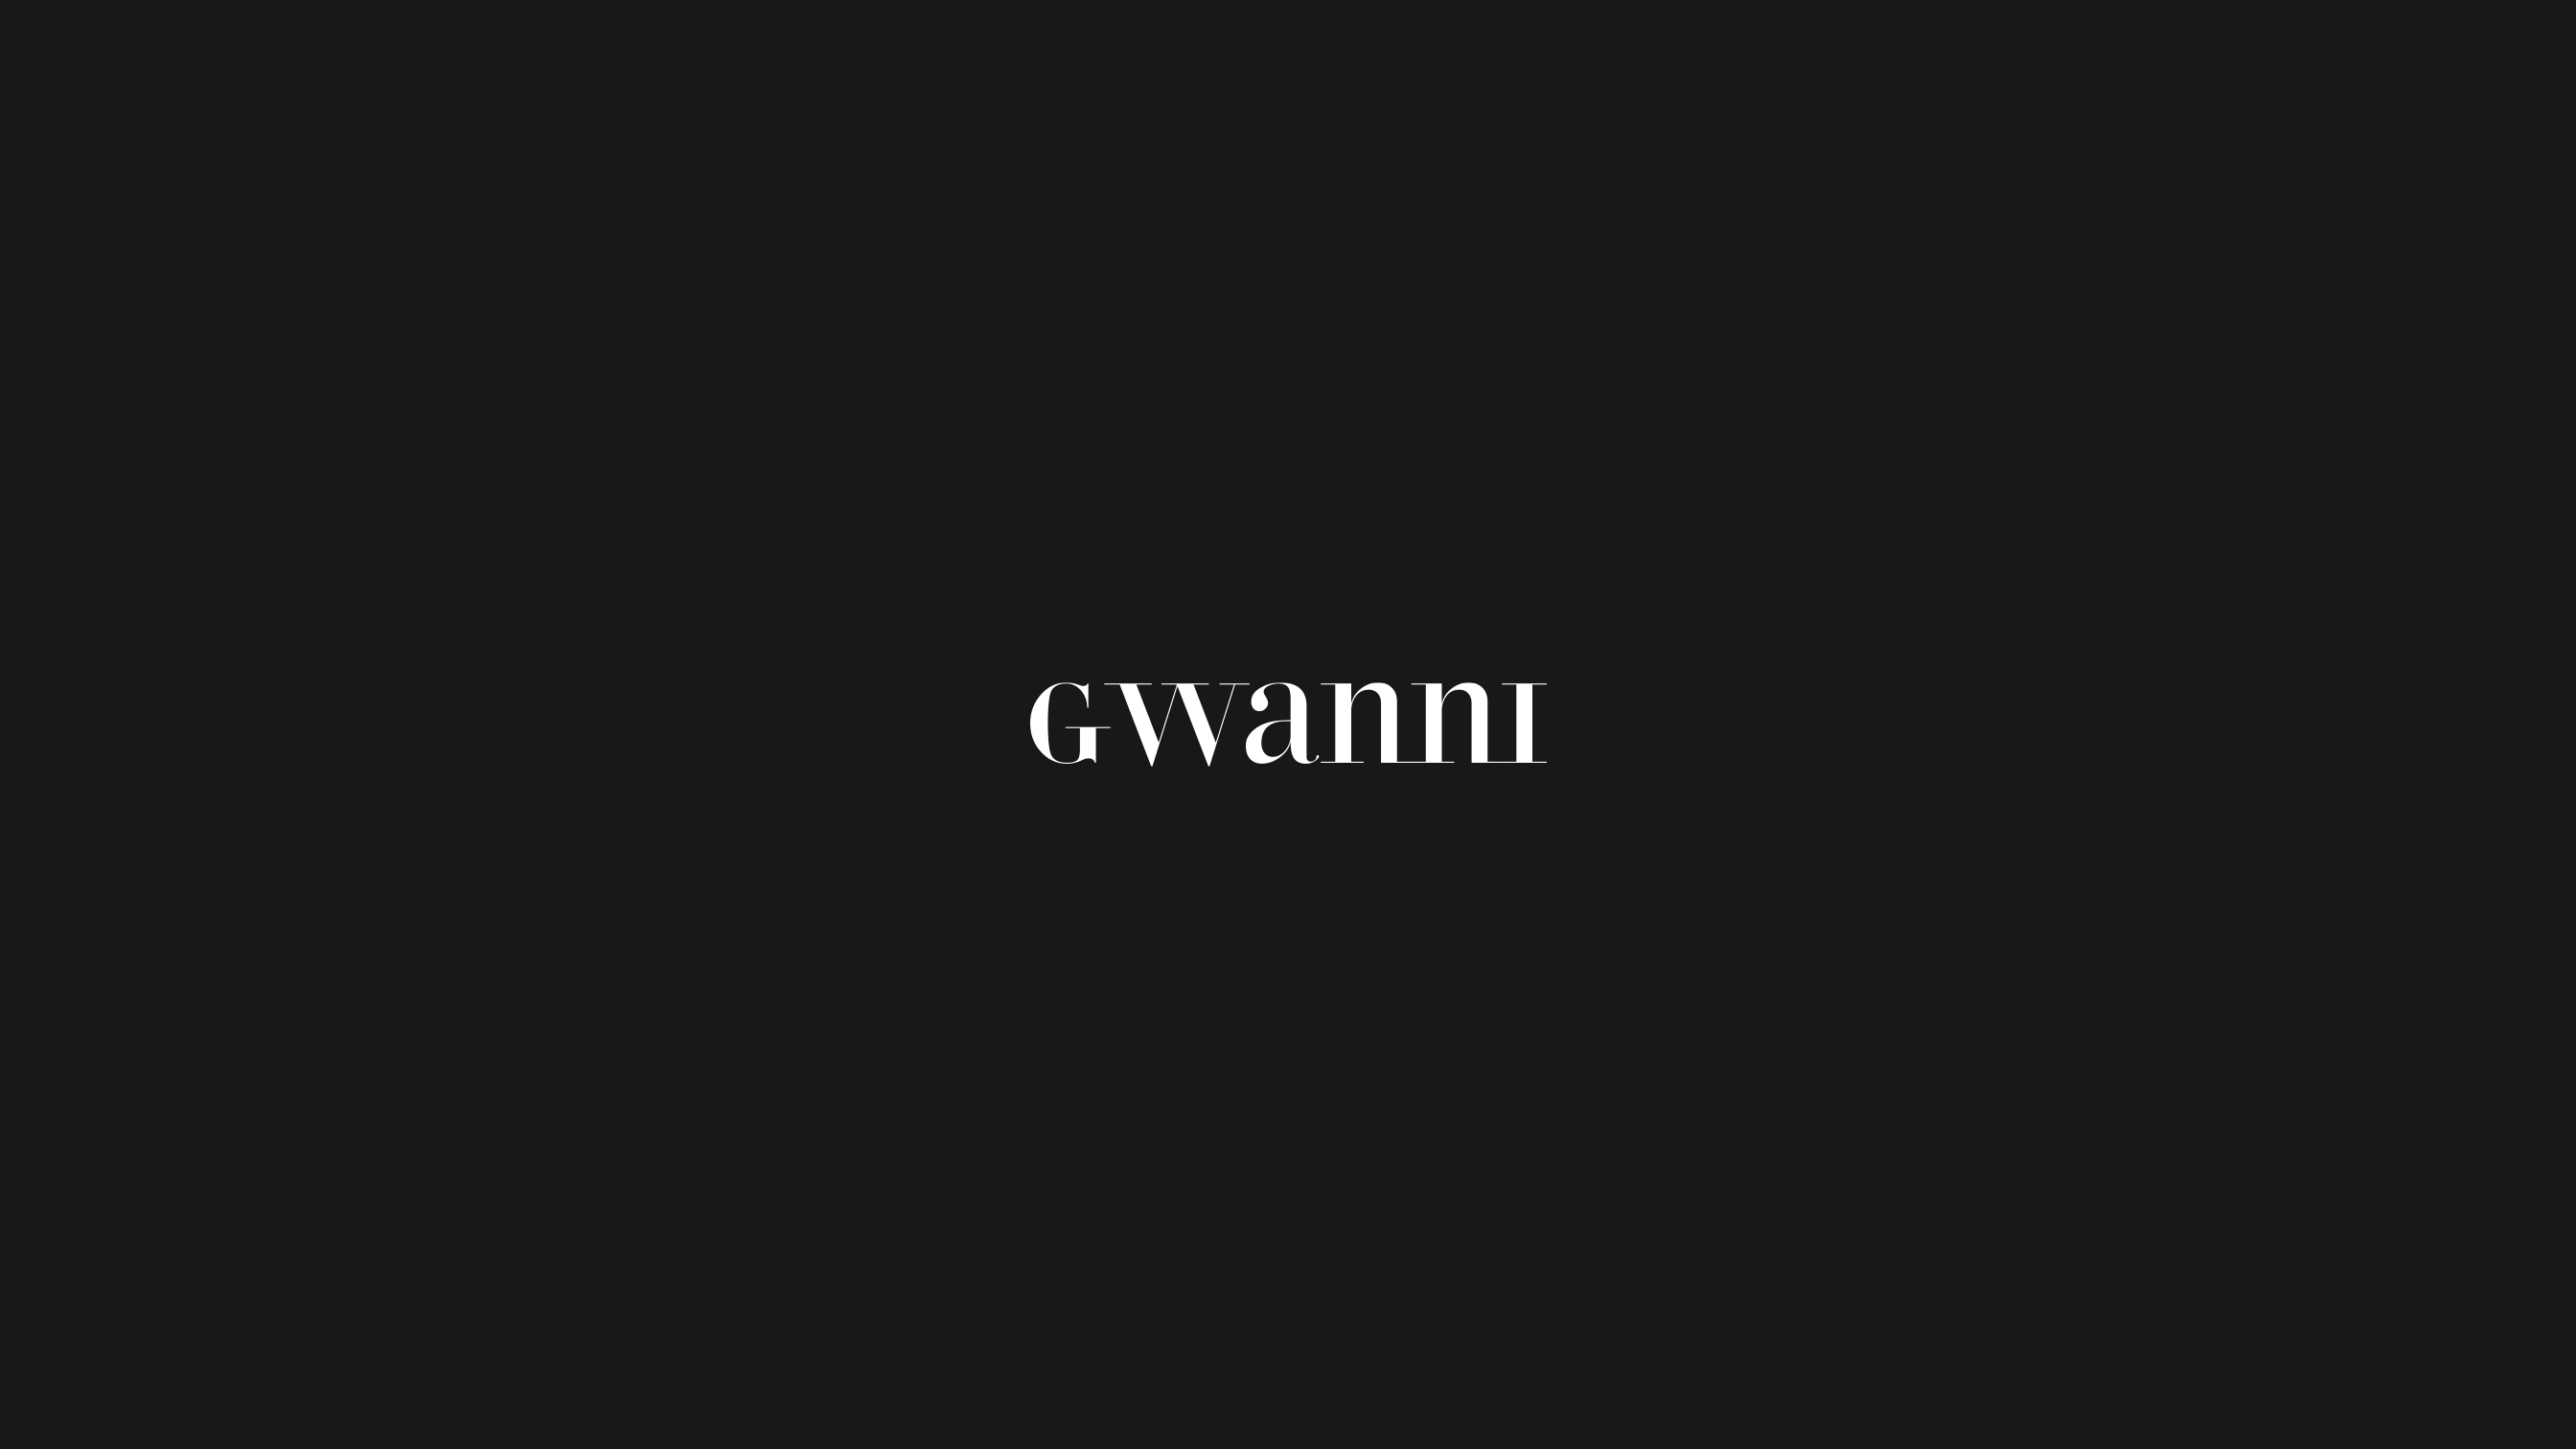 showcase-logotype-gwanni